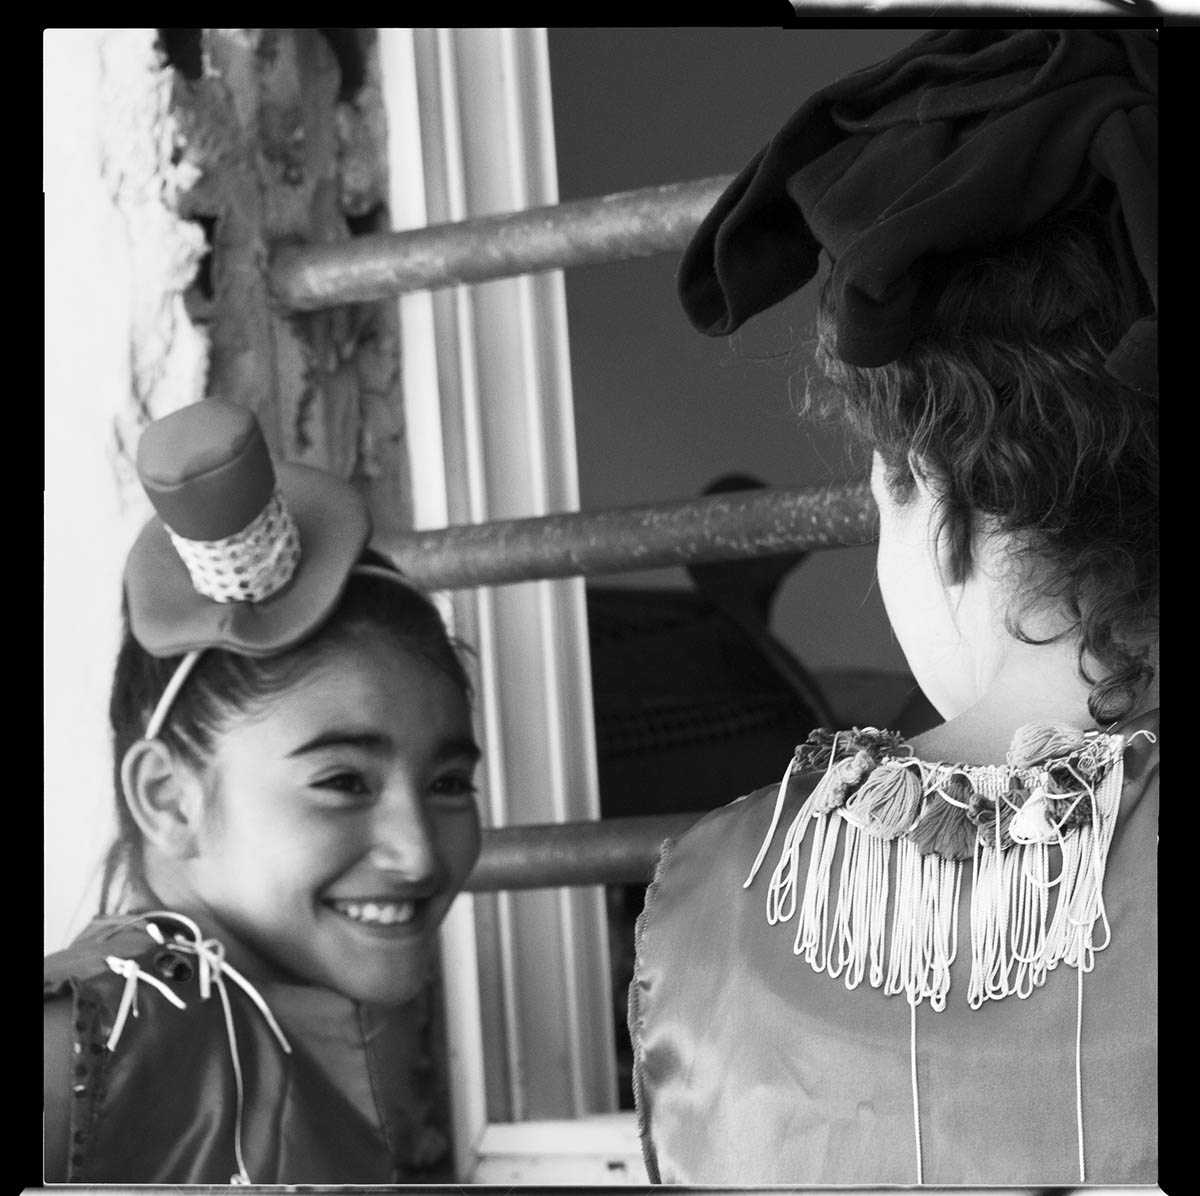 Las Pulgas del Tripezón - Carnaval de Mi Tandil 2016 - ph: Mercedes Segade